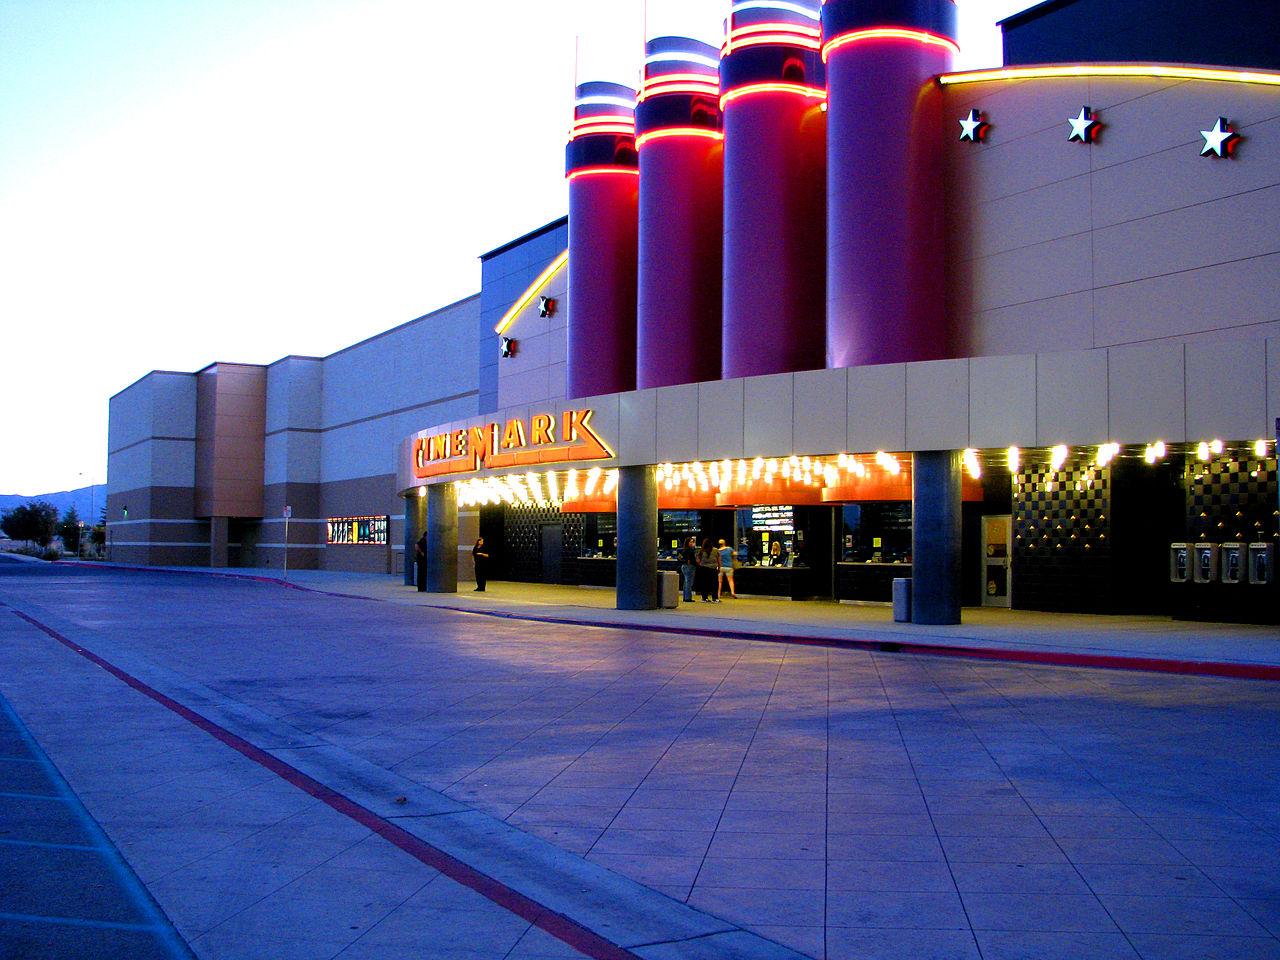 Cinemark cinema : Electric meat slicers